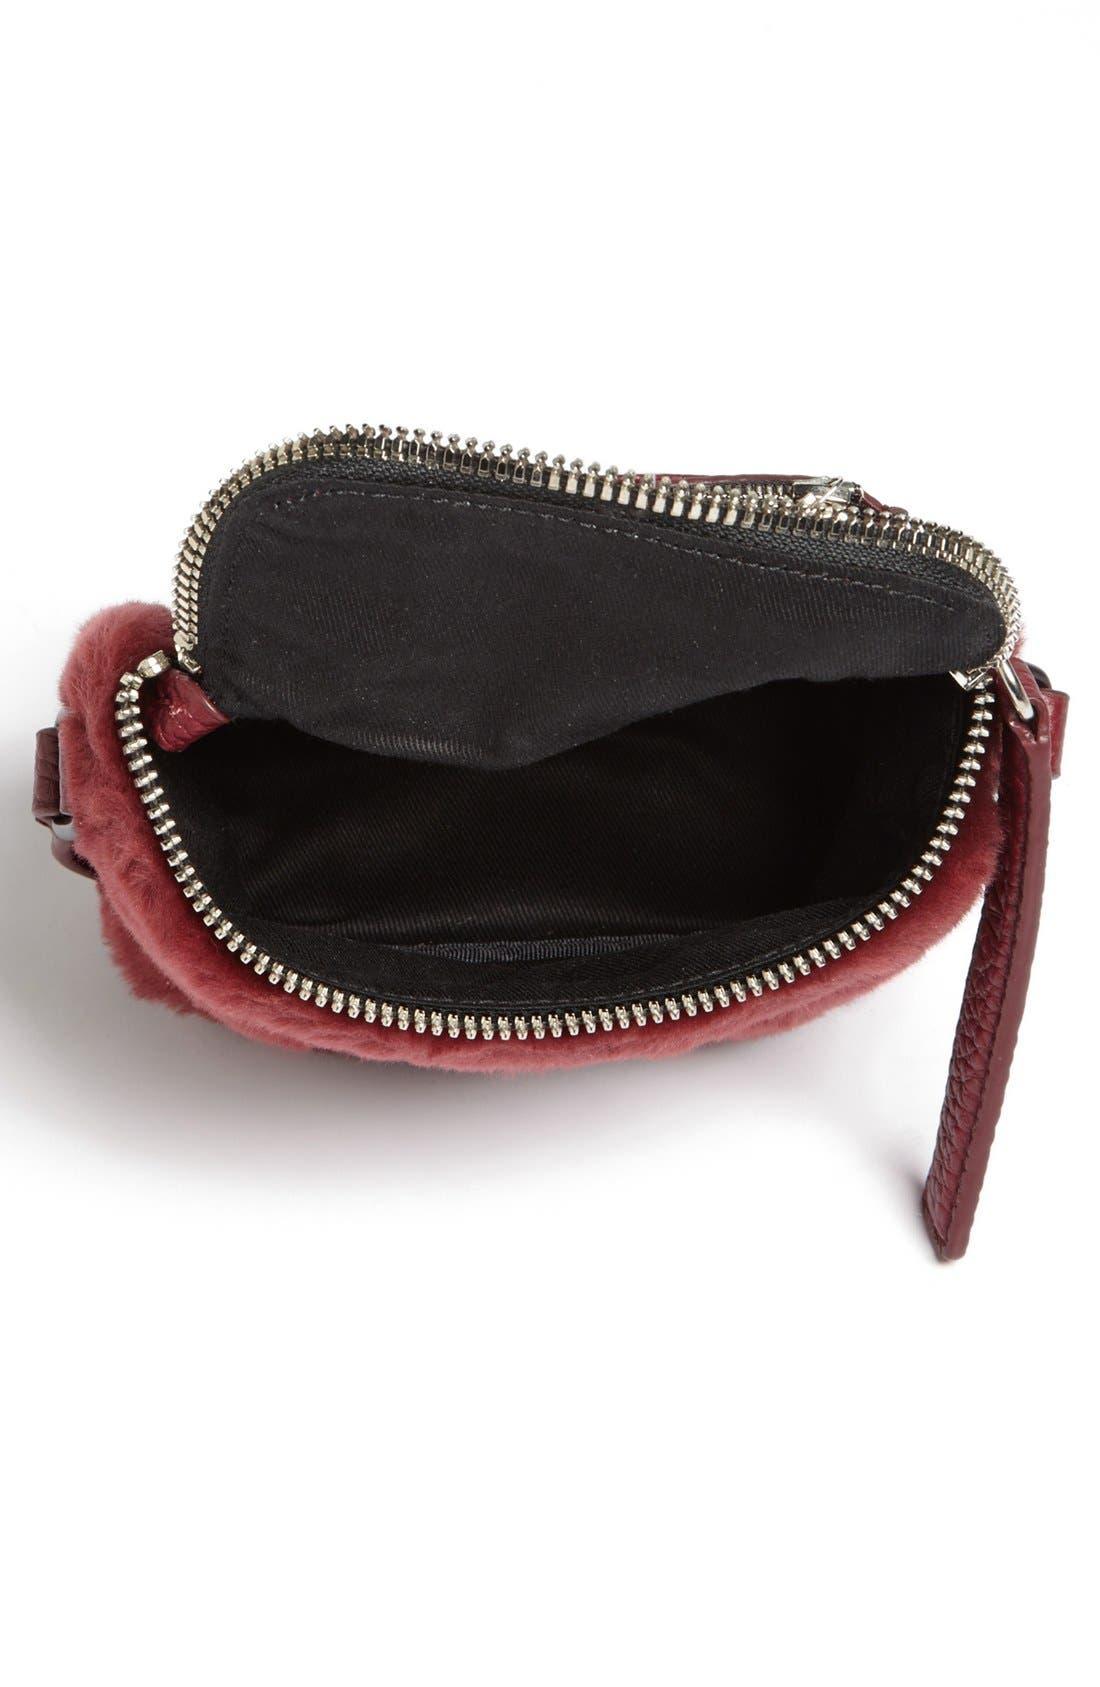 Alternate Image 3  - Kara 'Stowaway' Pebbled Leather & Genuine Shearling Crossbody Bag, Small